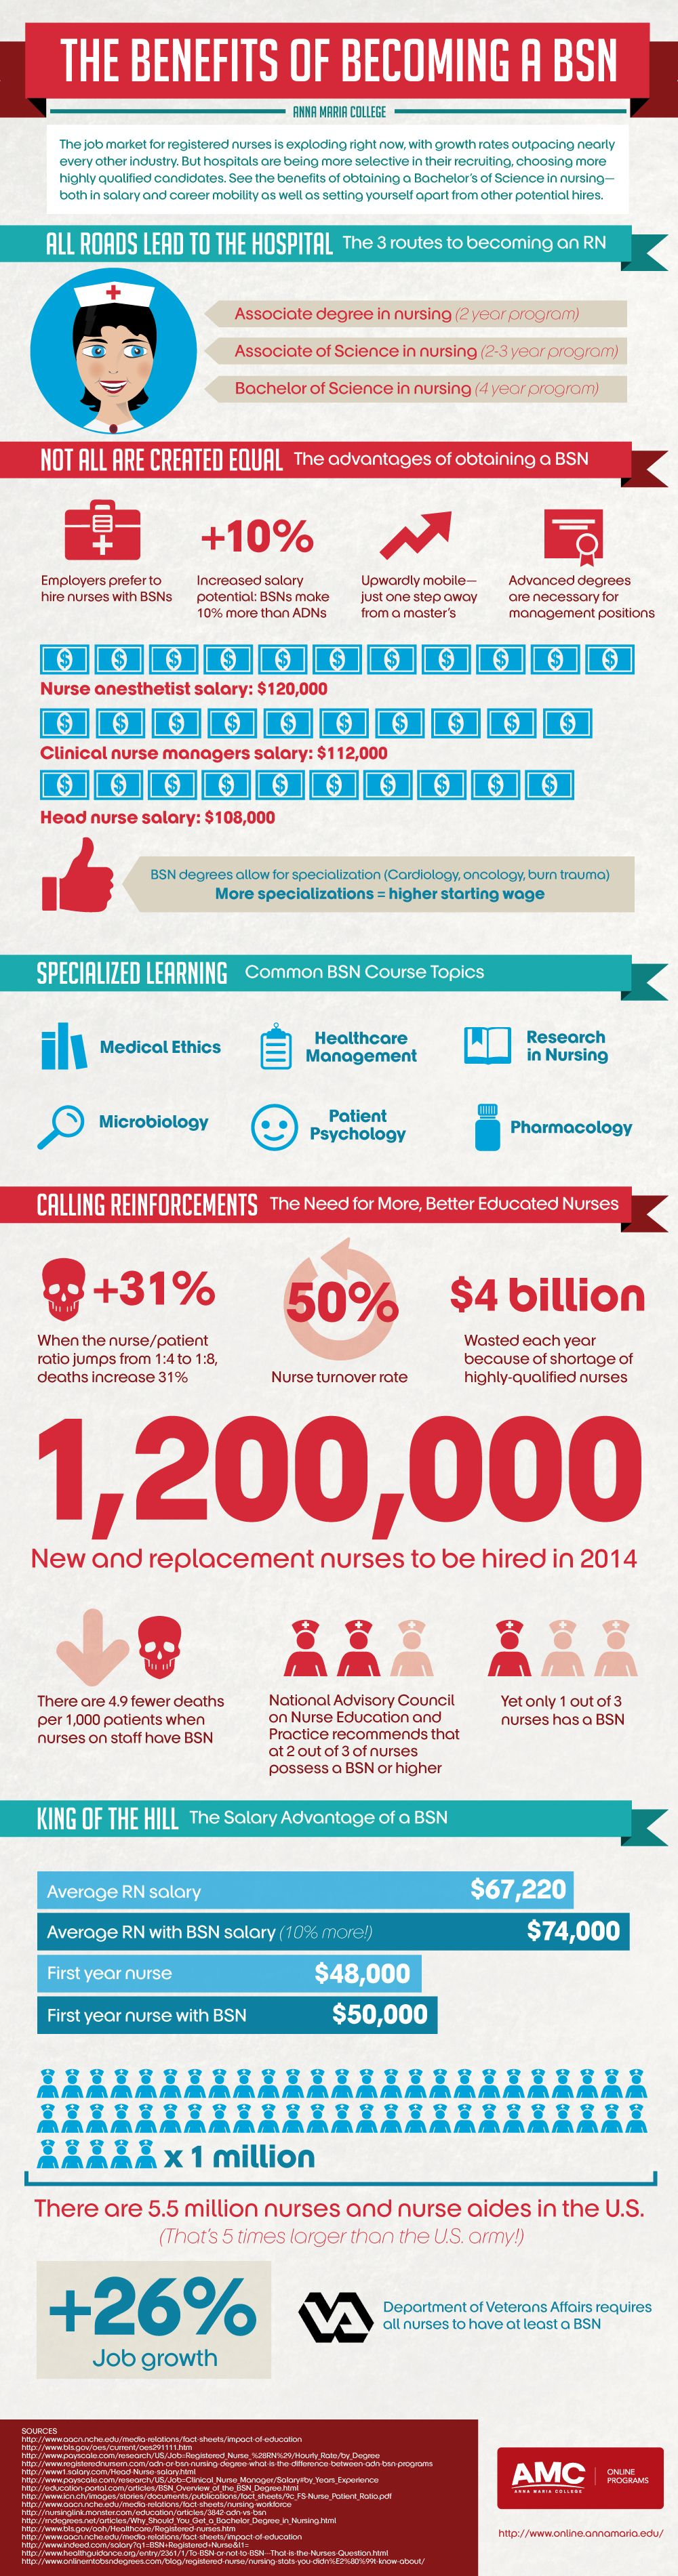 Nursing Infographic Overload 10 Nursing Infographics You Won T Want To Miss Uticacollege Nursing Infographic Online Nursing Schools Nursing School Tips